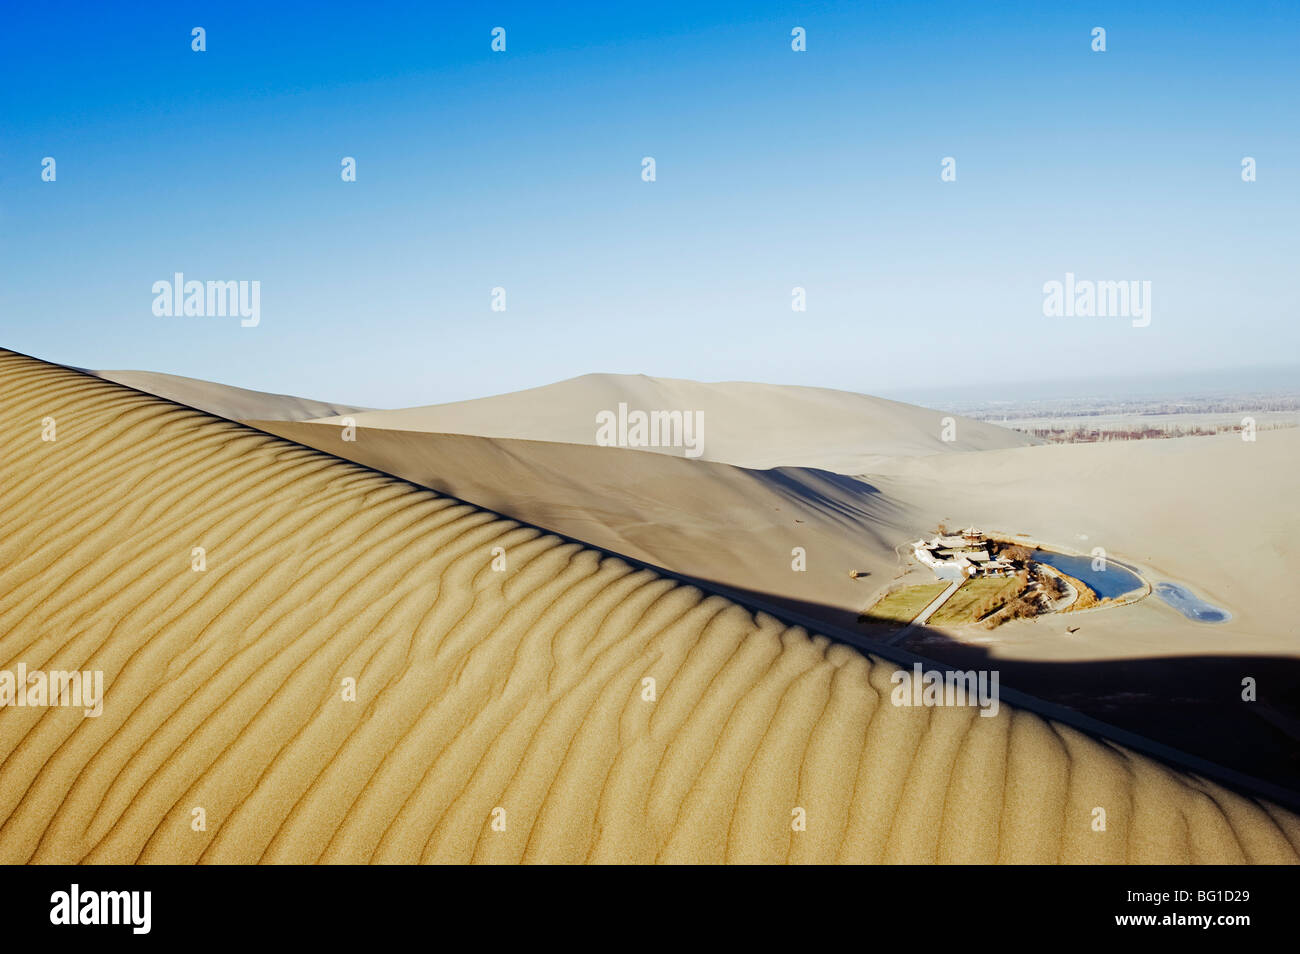 Ming Sha sand dunes and pavilion at Crescent Moon Lake, Dunhuang, Gansu Province, China, Asia - Stock Image